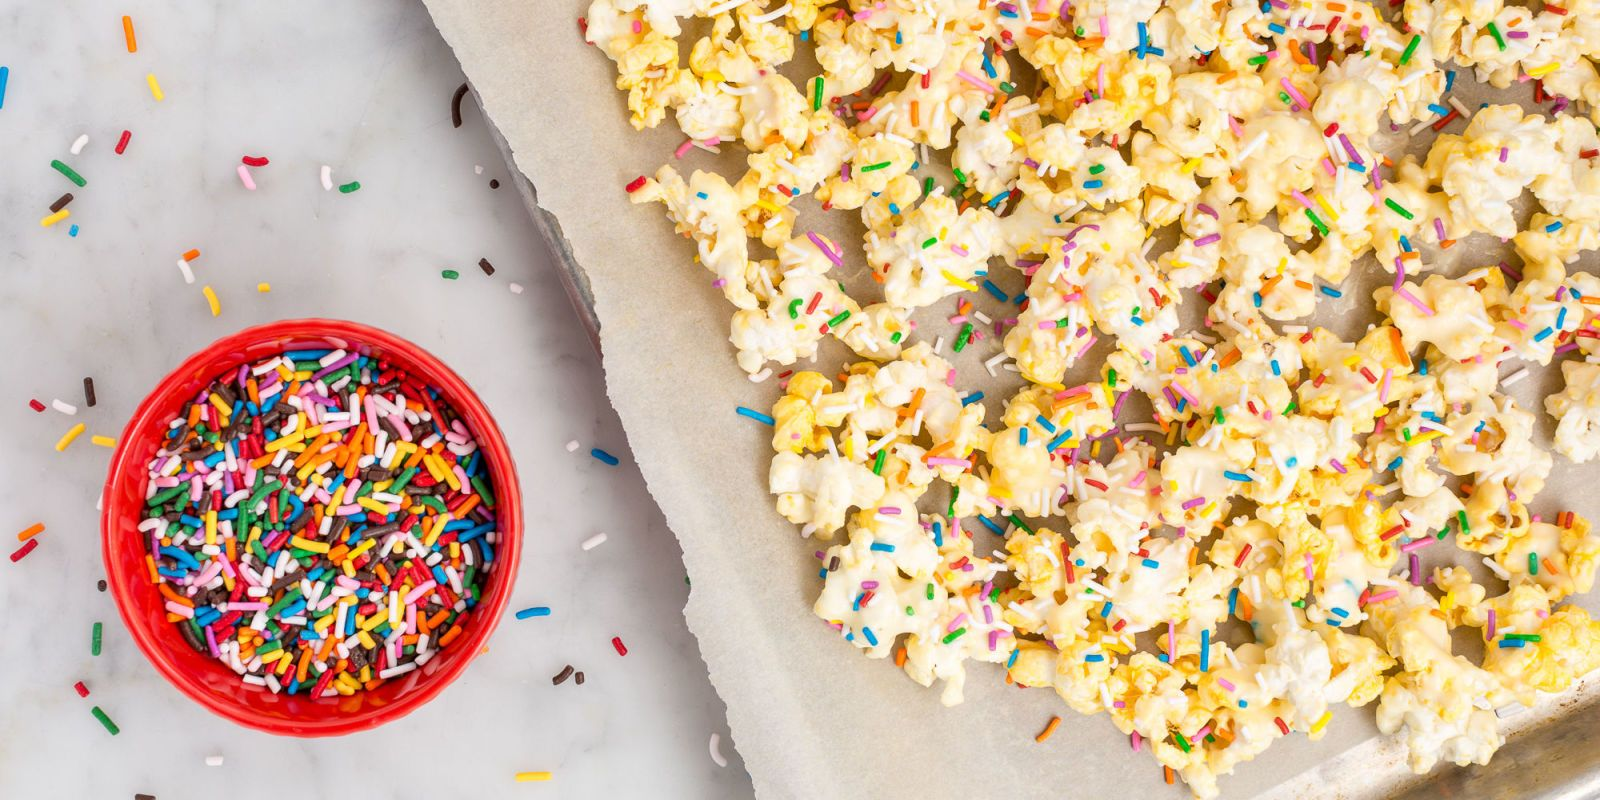 7 Popcorn Hacks That Will Seriously Upgrade Movie Night